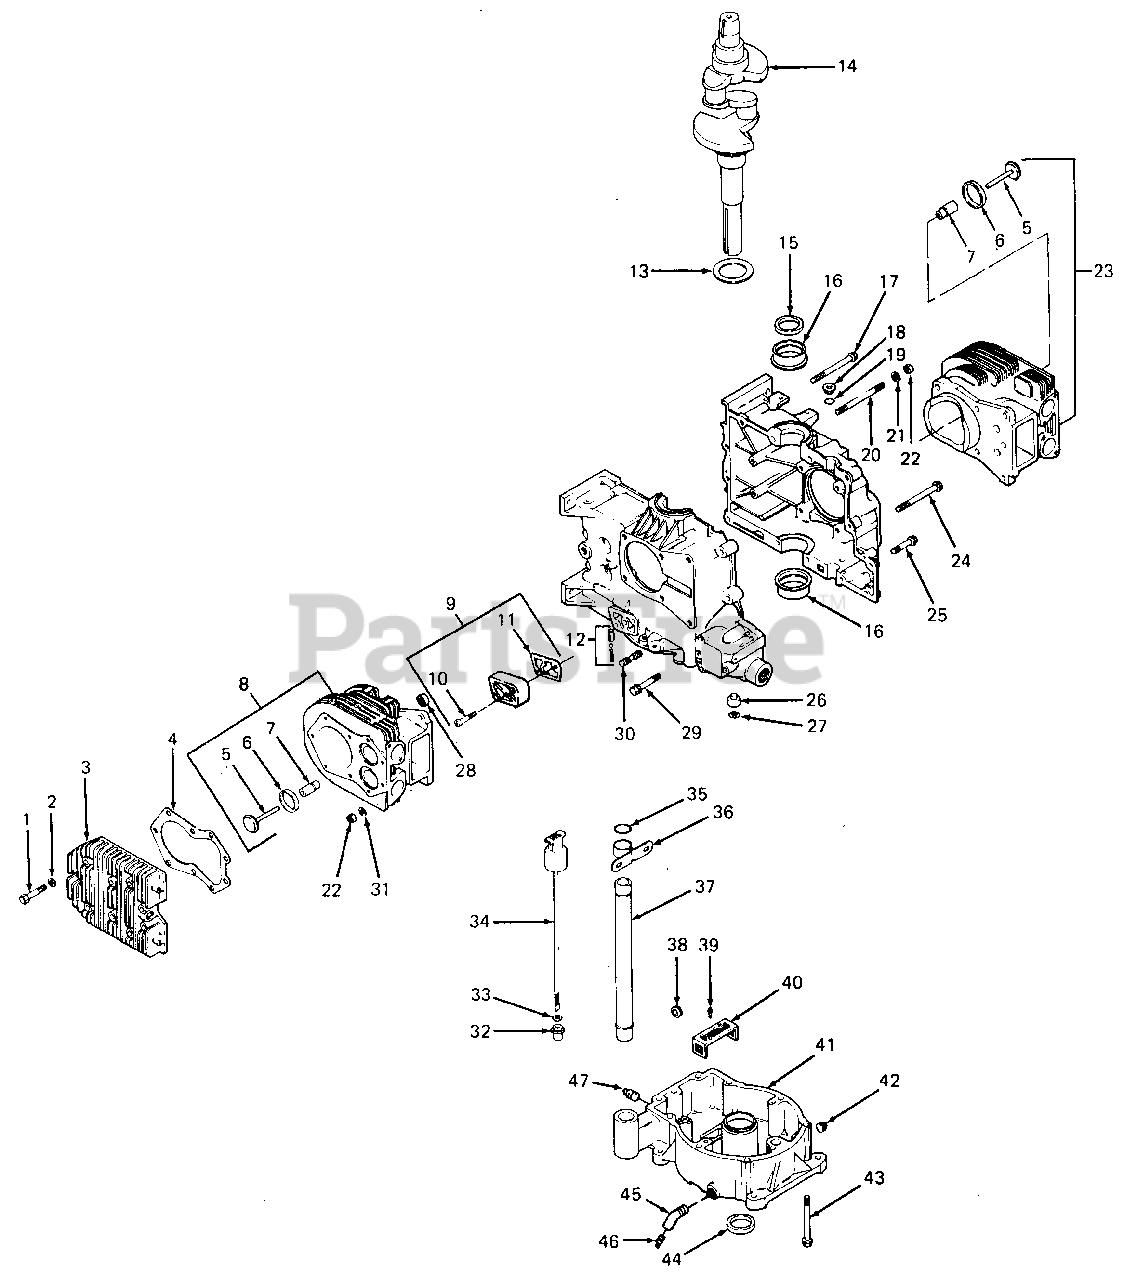 Cub Cadet Garden Tractor Kohler Engine Parts